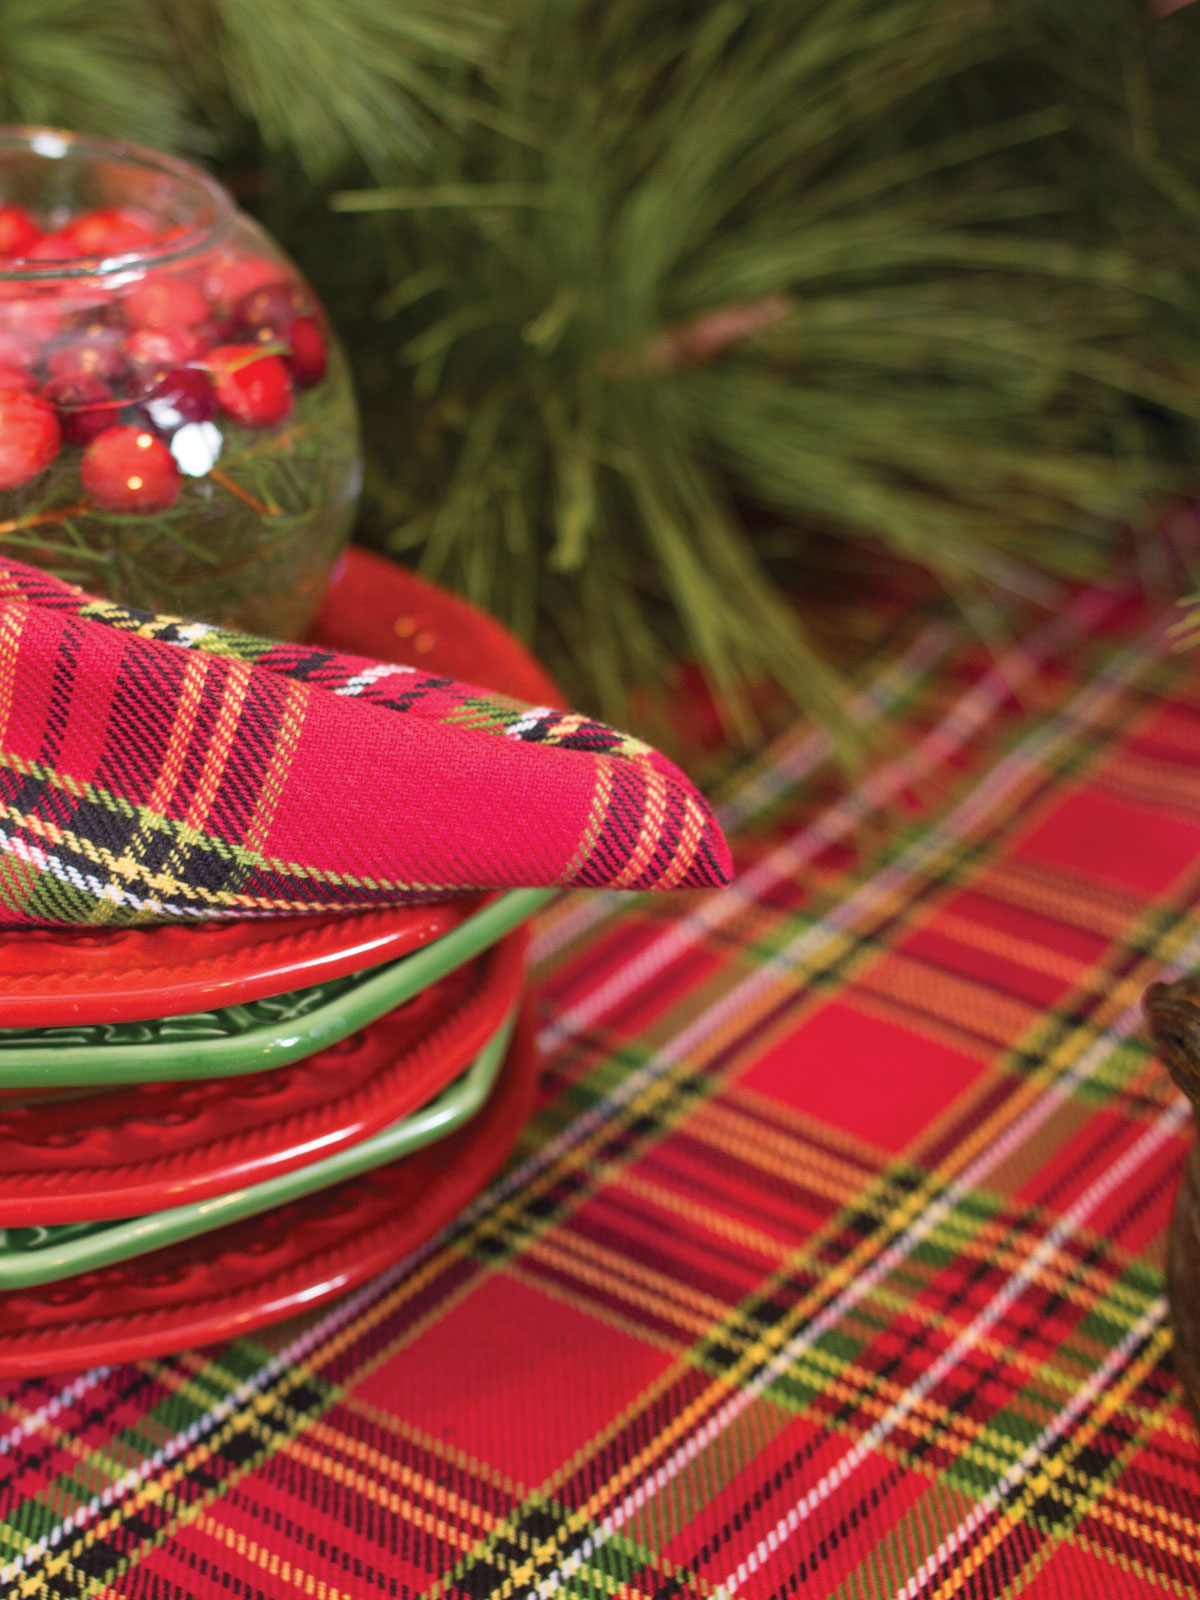 tartan plaid tablecloth your home christmas forever. Black Bedroom Furniture Sets. Home Design Ideas